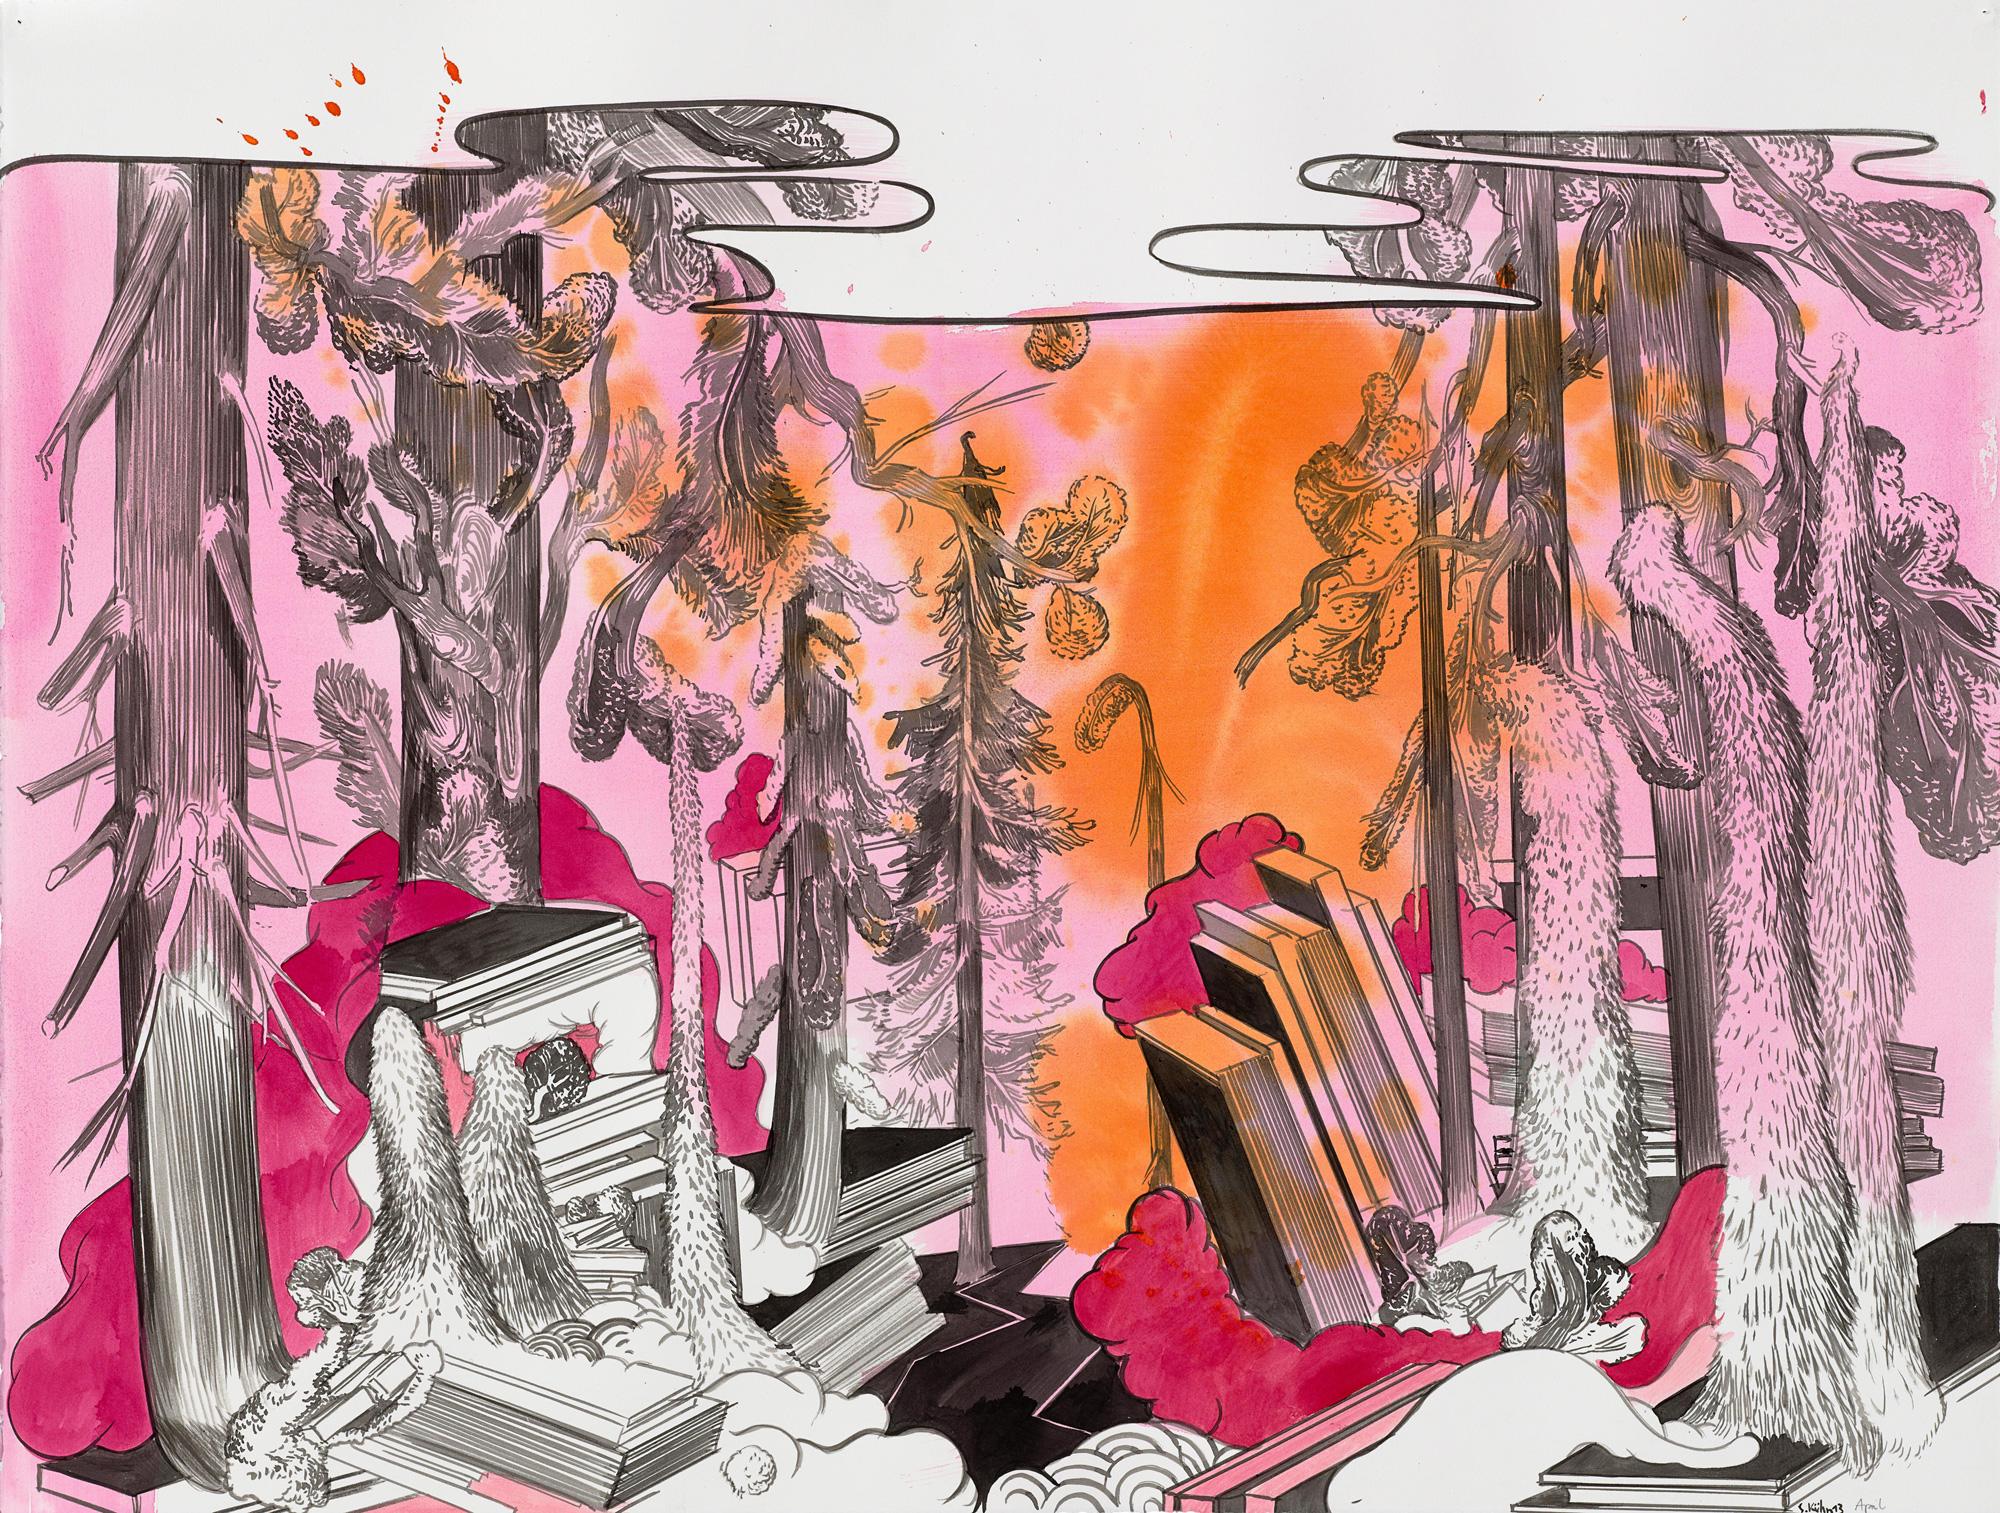 Artwork by Susanne Kuhn